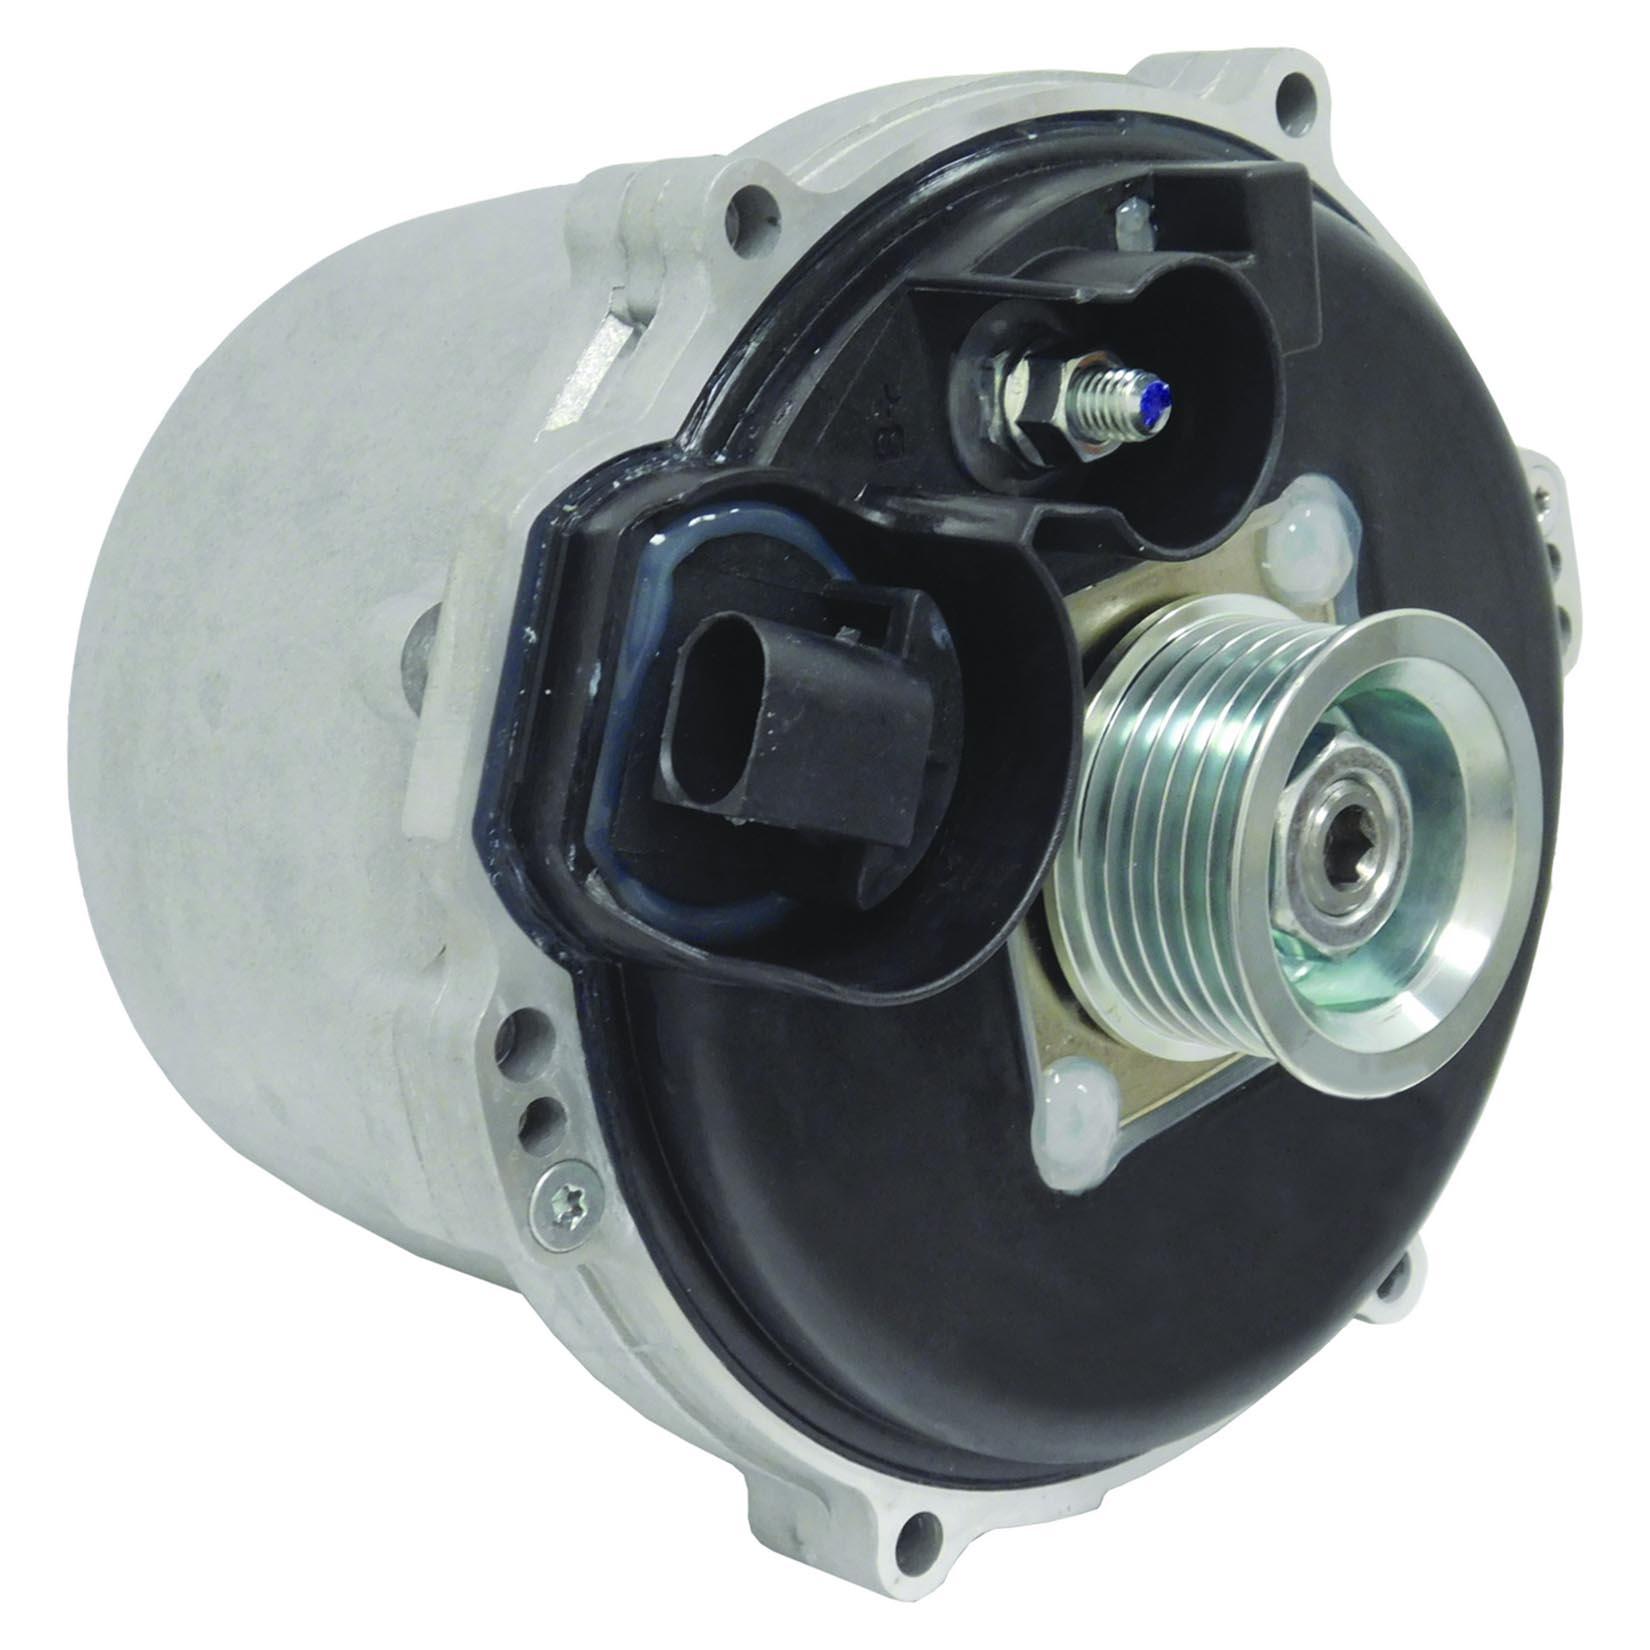 New Alternator For Bmw 4 4l 745i  745li  2002 2003 2004